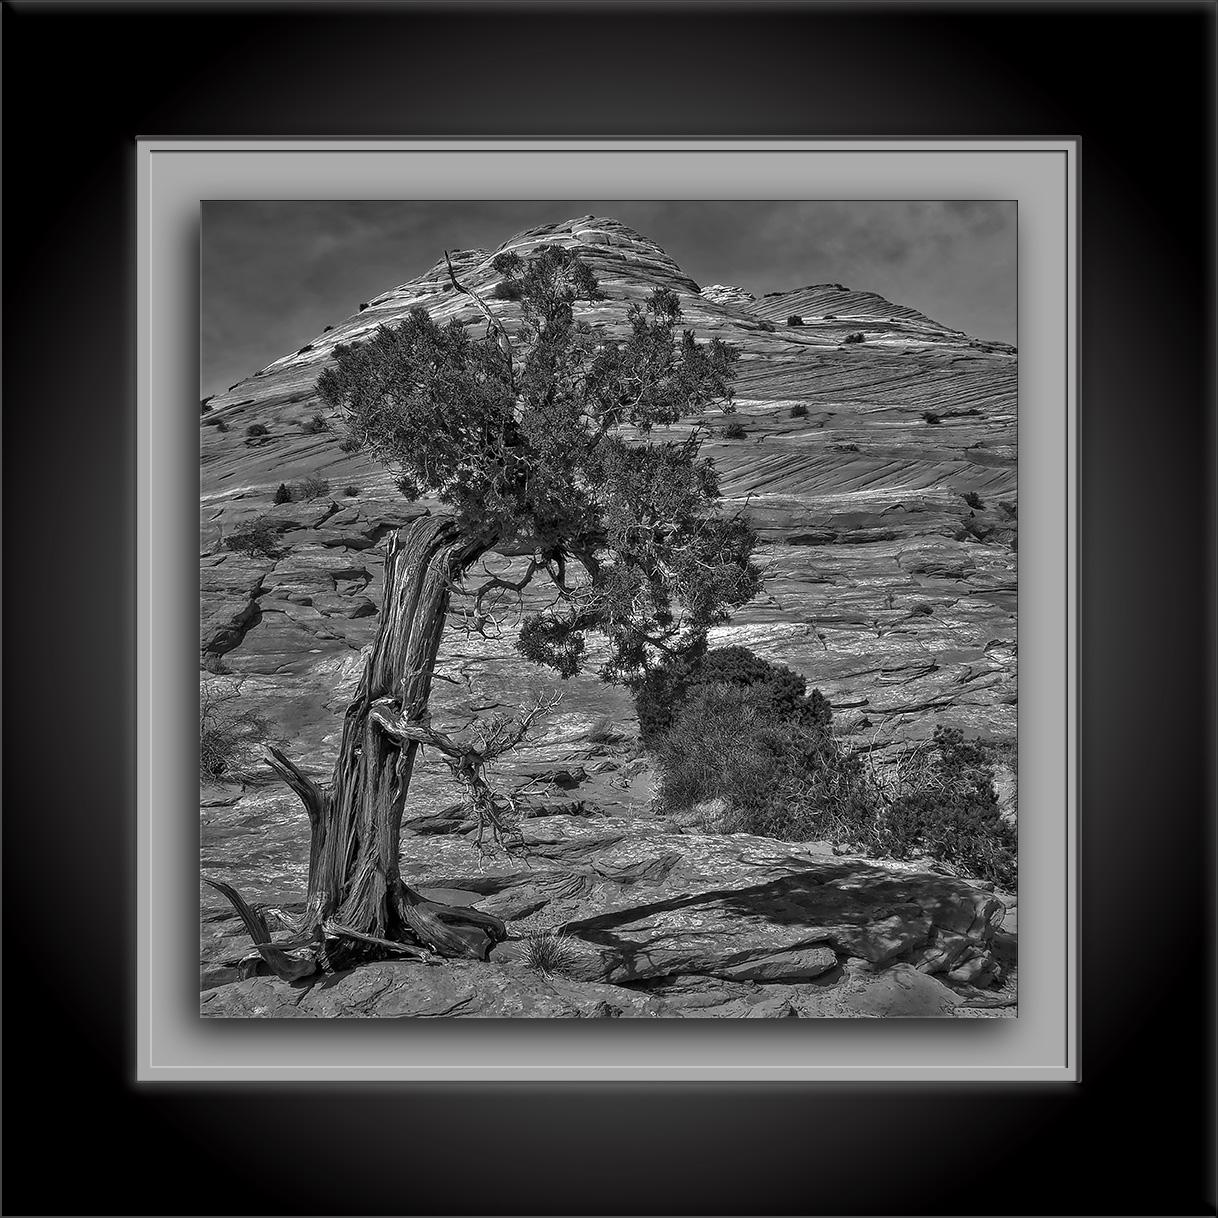 The Wave March Tree-2012-03-21-Edit-2-B&W-72